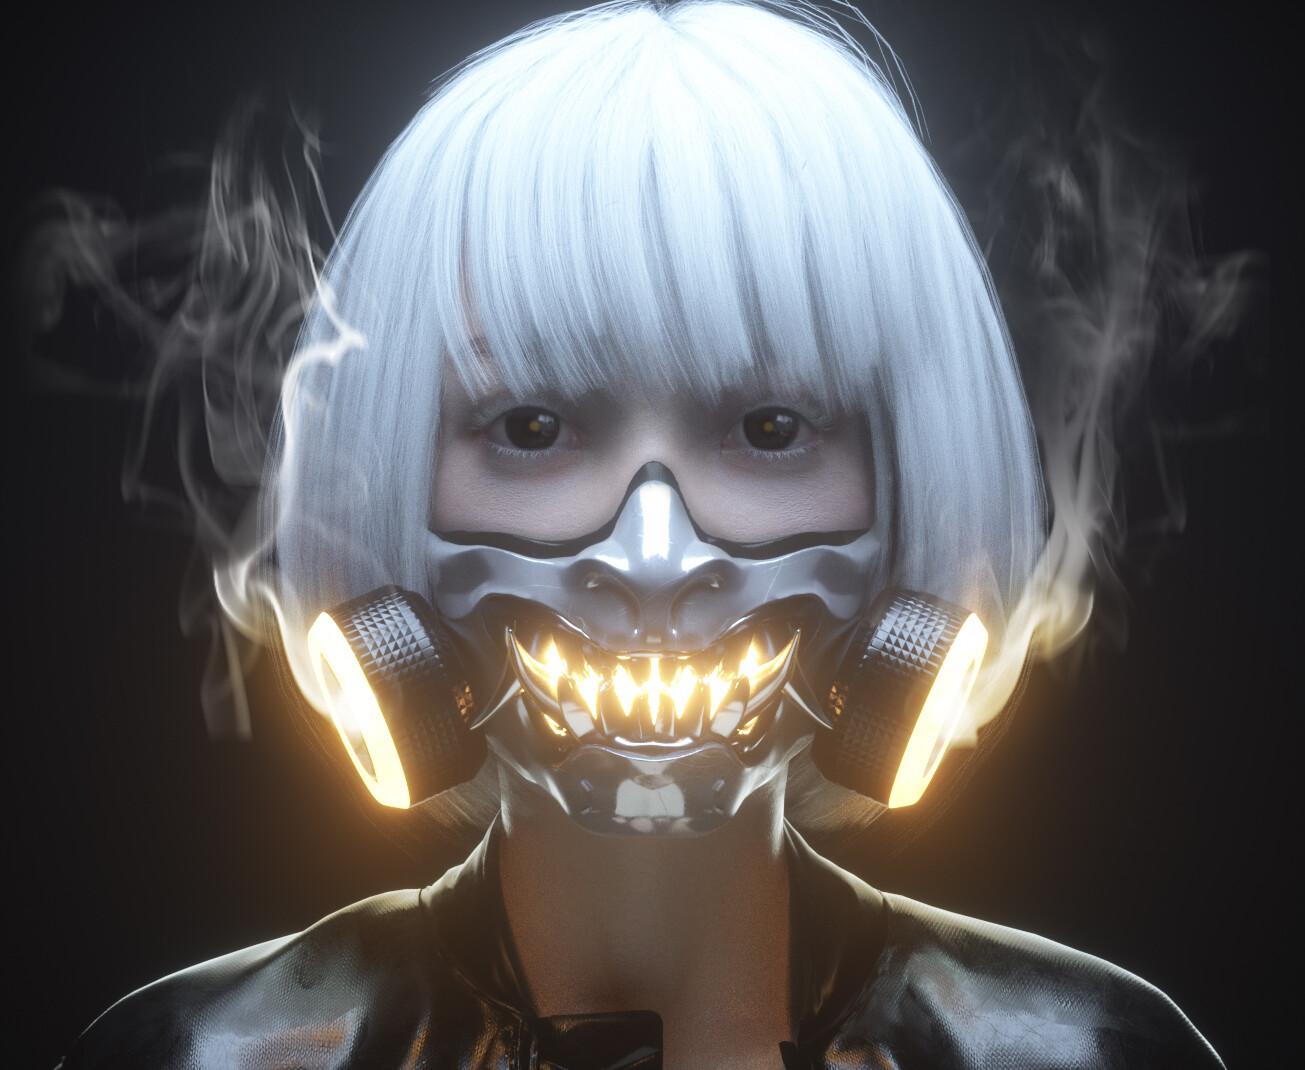 Cyberpunk Mask/Respirator